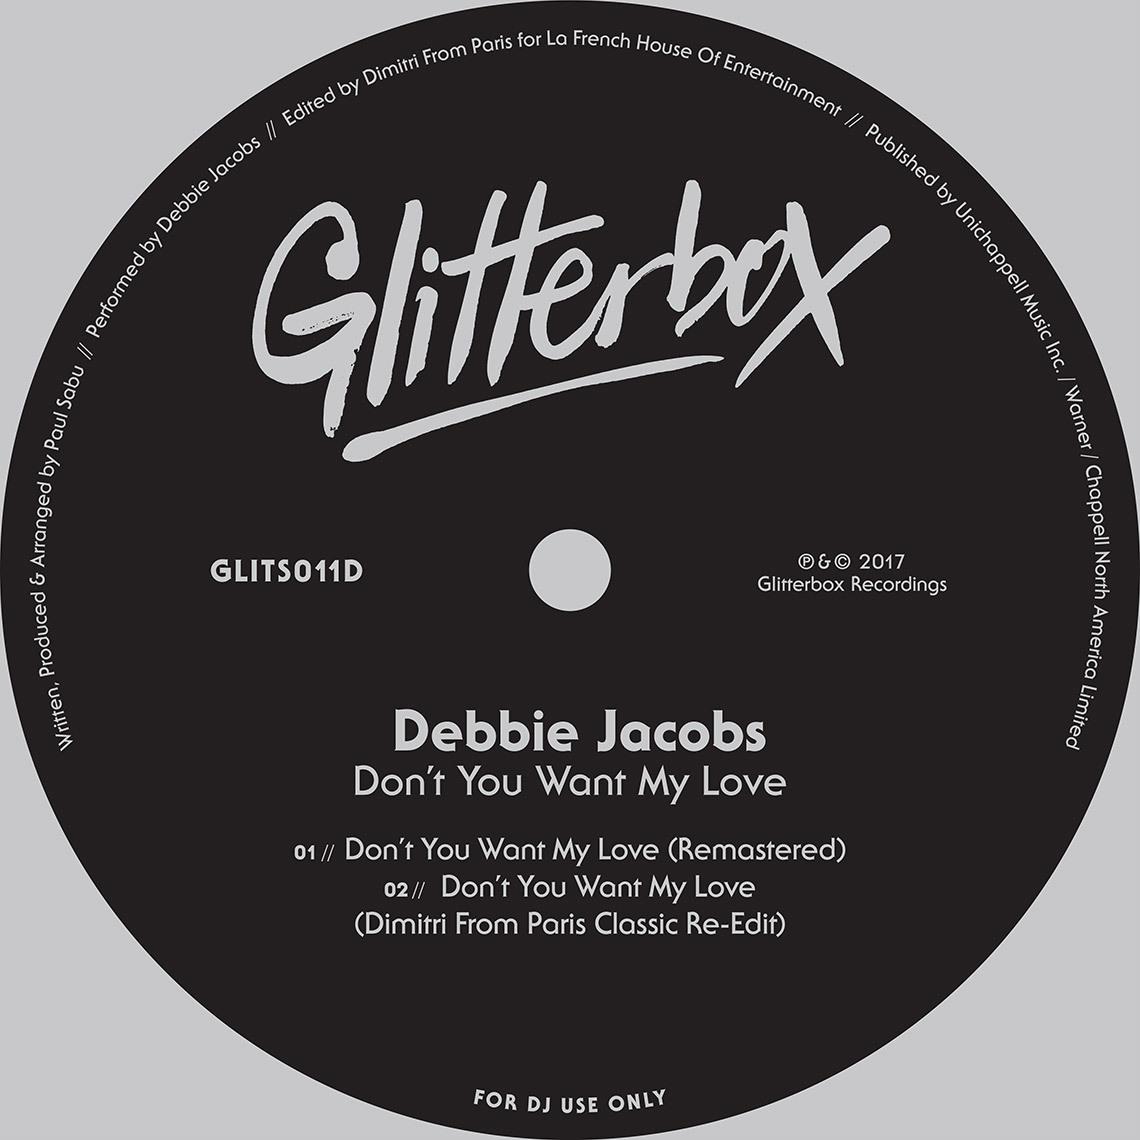 Debbiejacobs